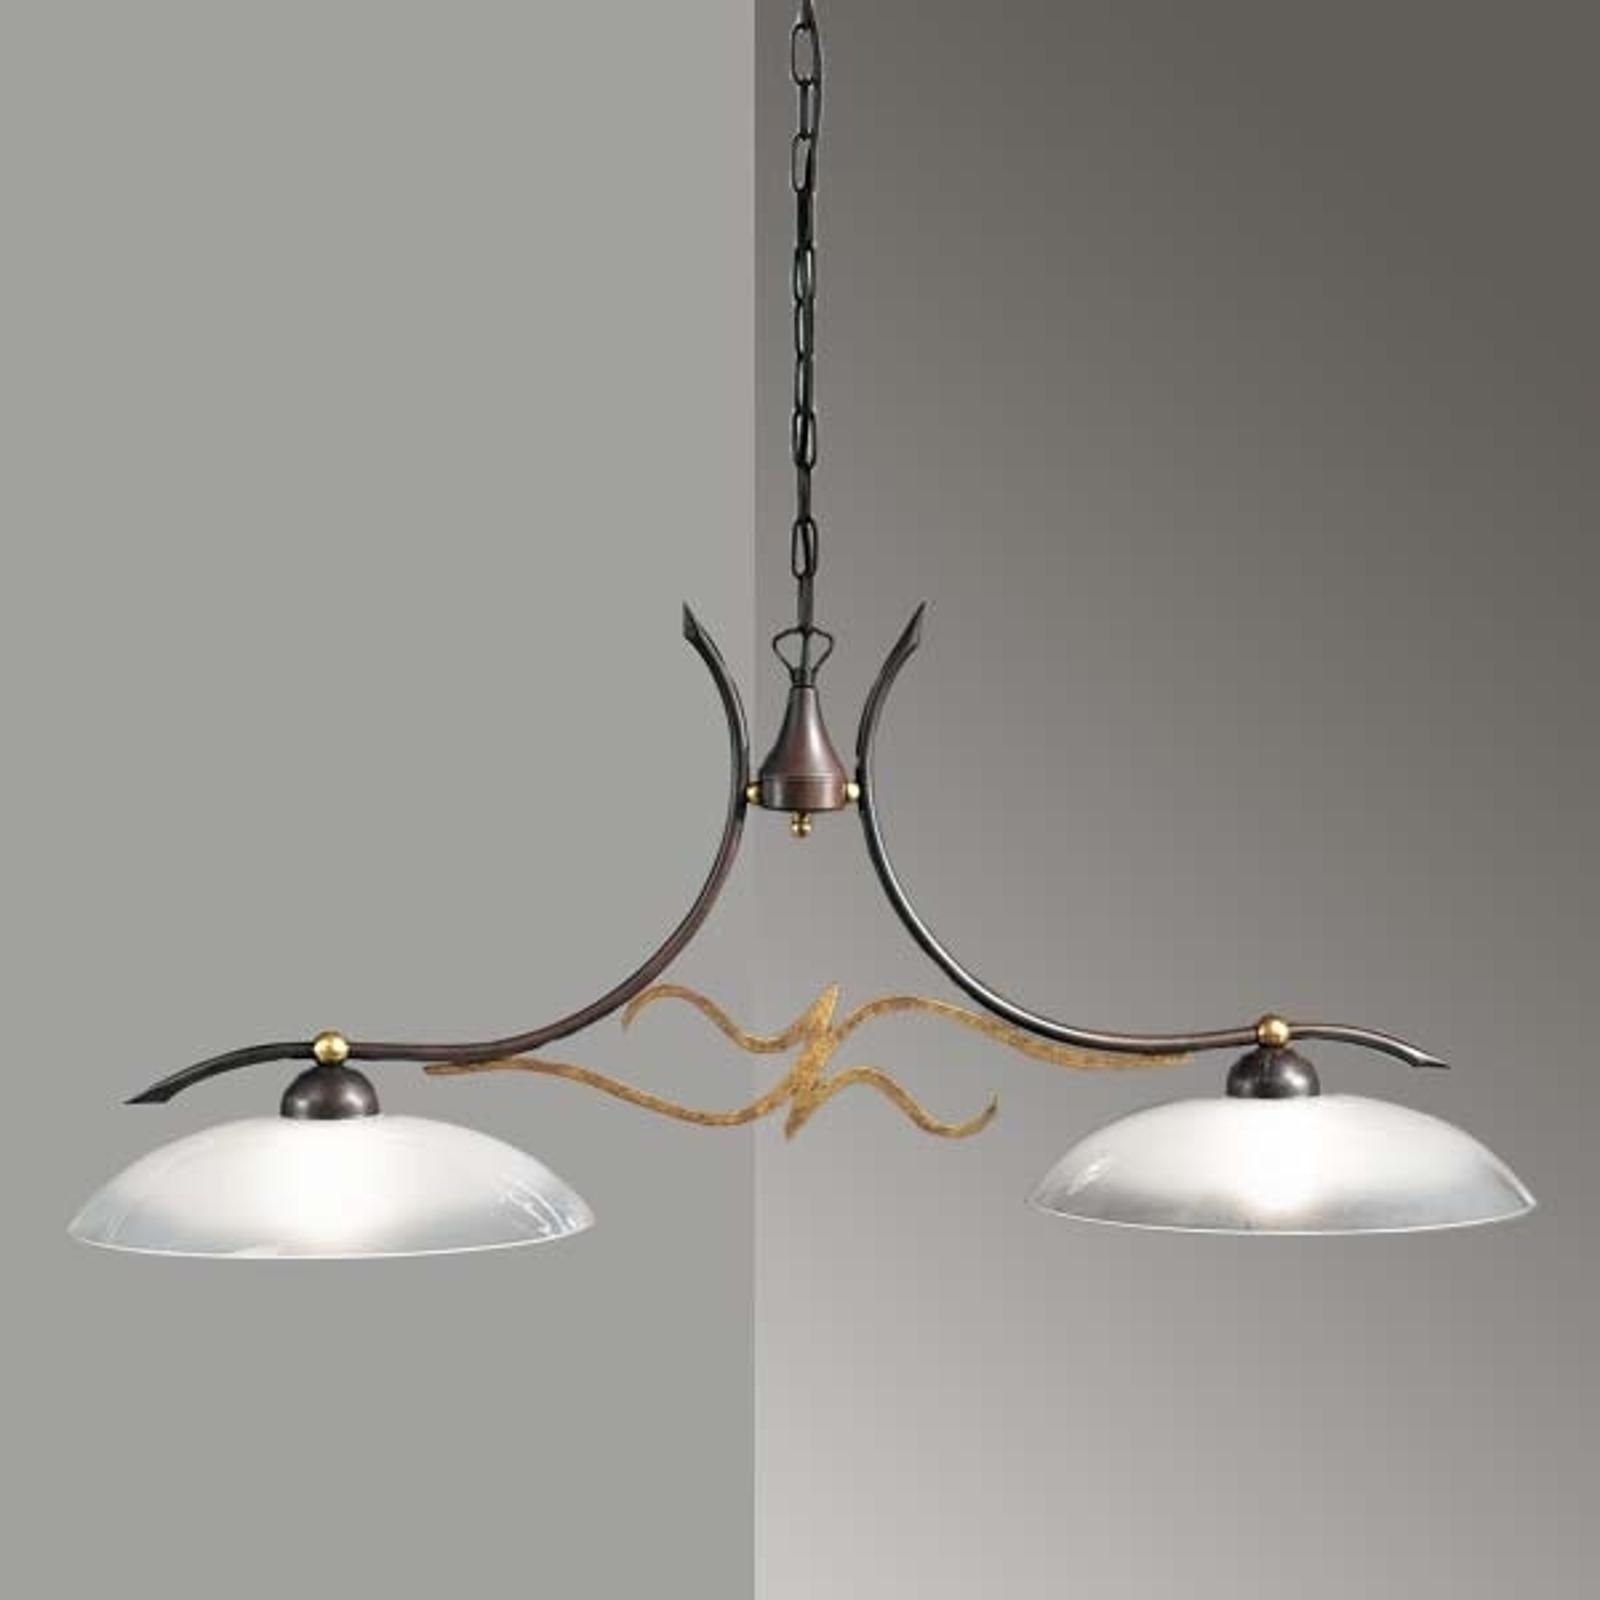 Hanglamp in landhuisstijl AMABILE, 2-lichts